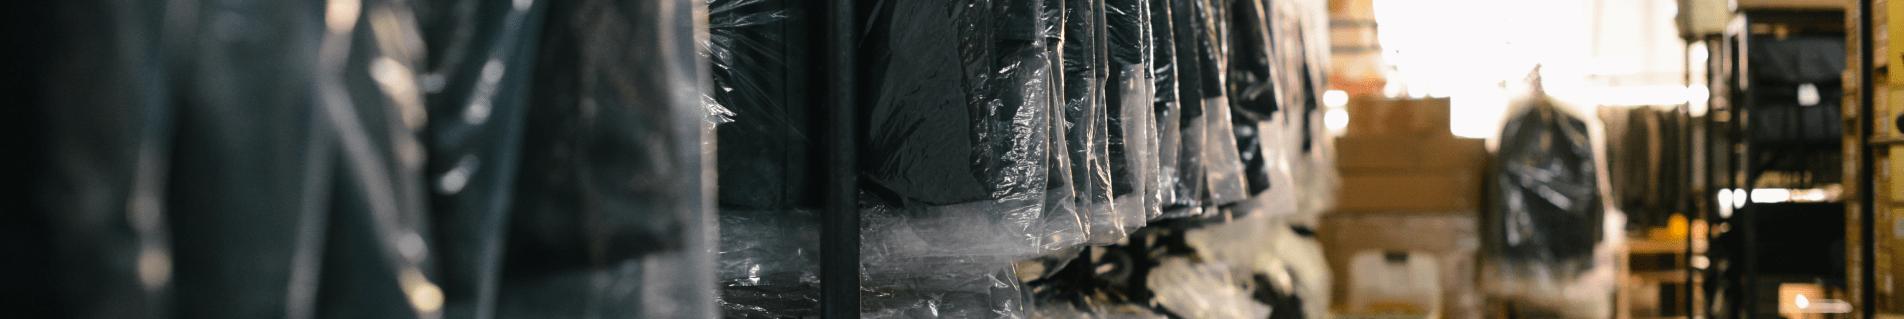 Химчистка дубленок